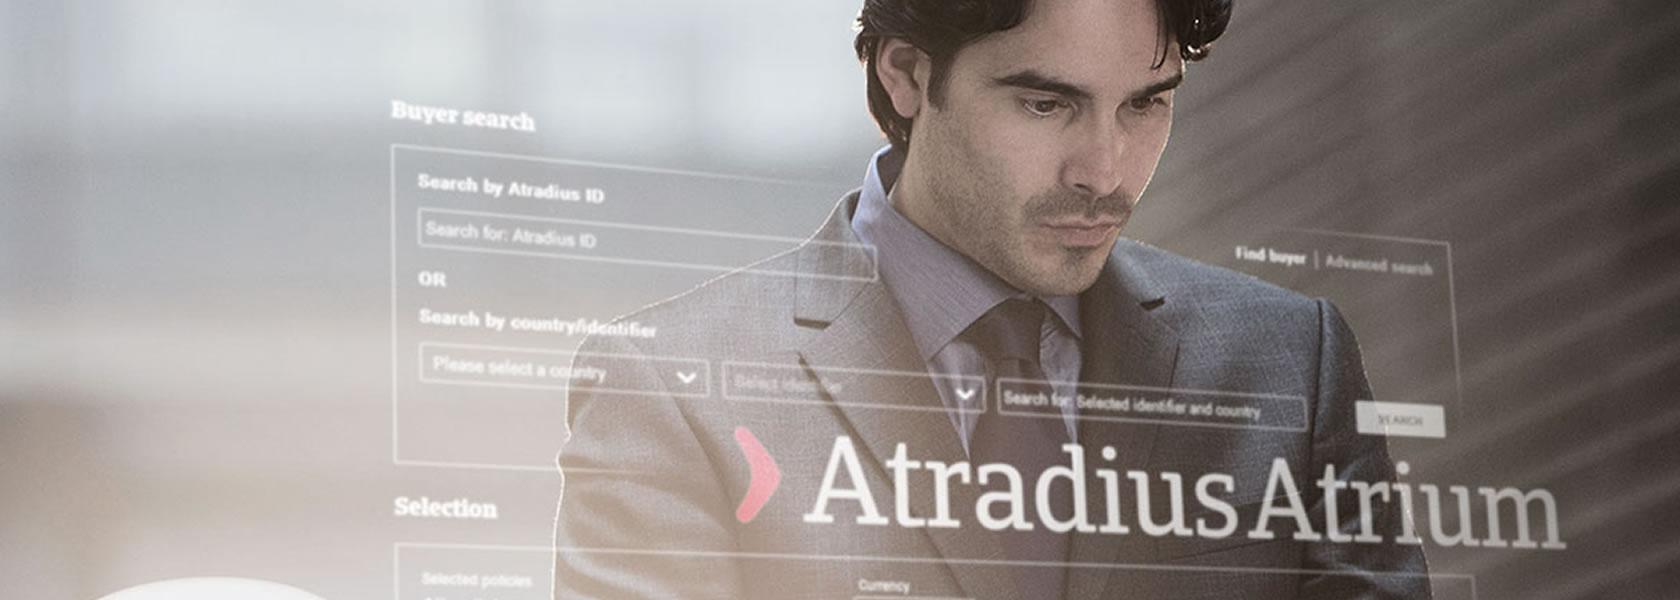 Techrise_Atradius